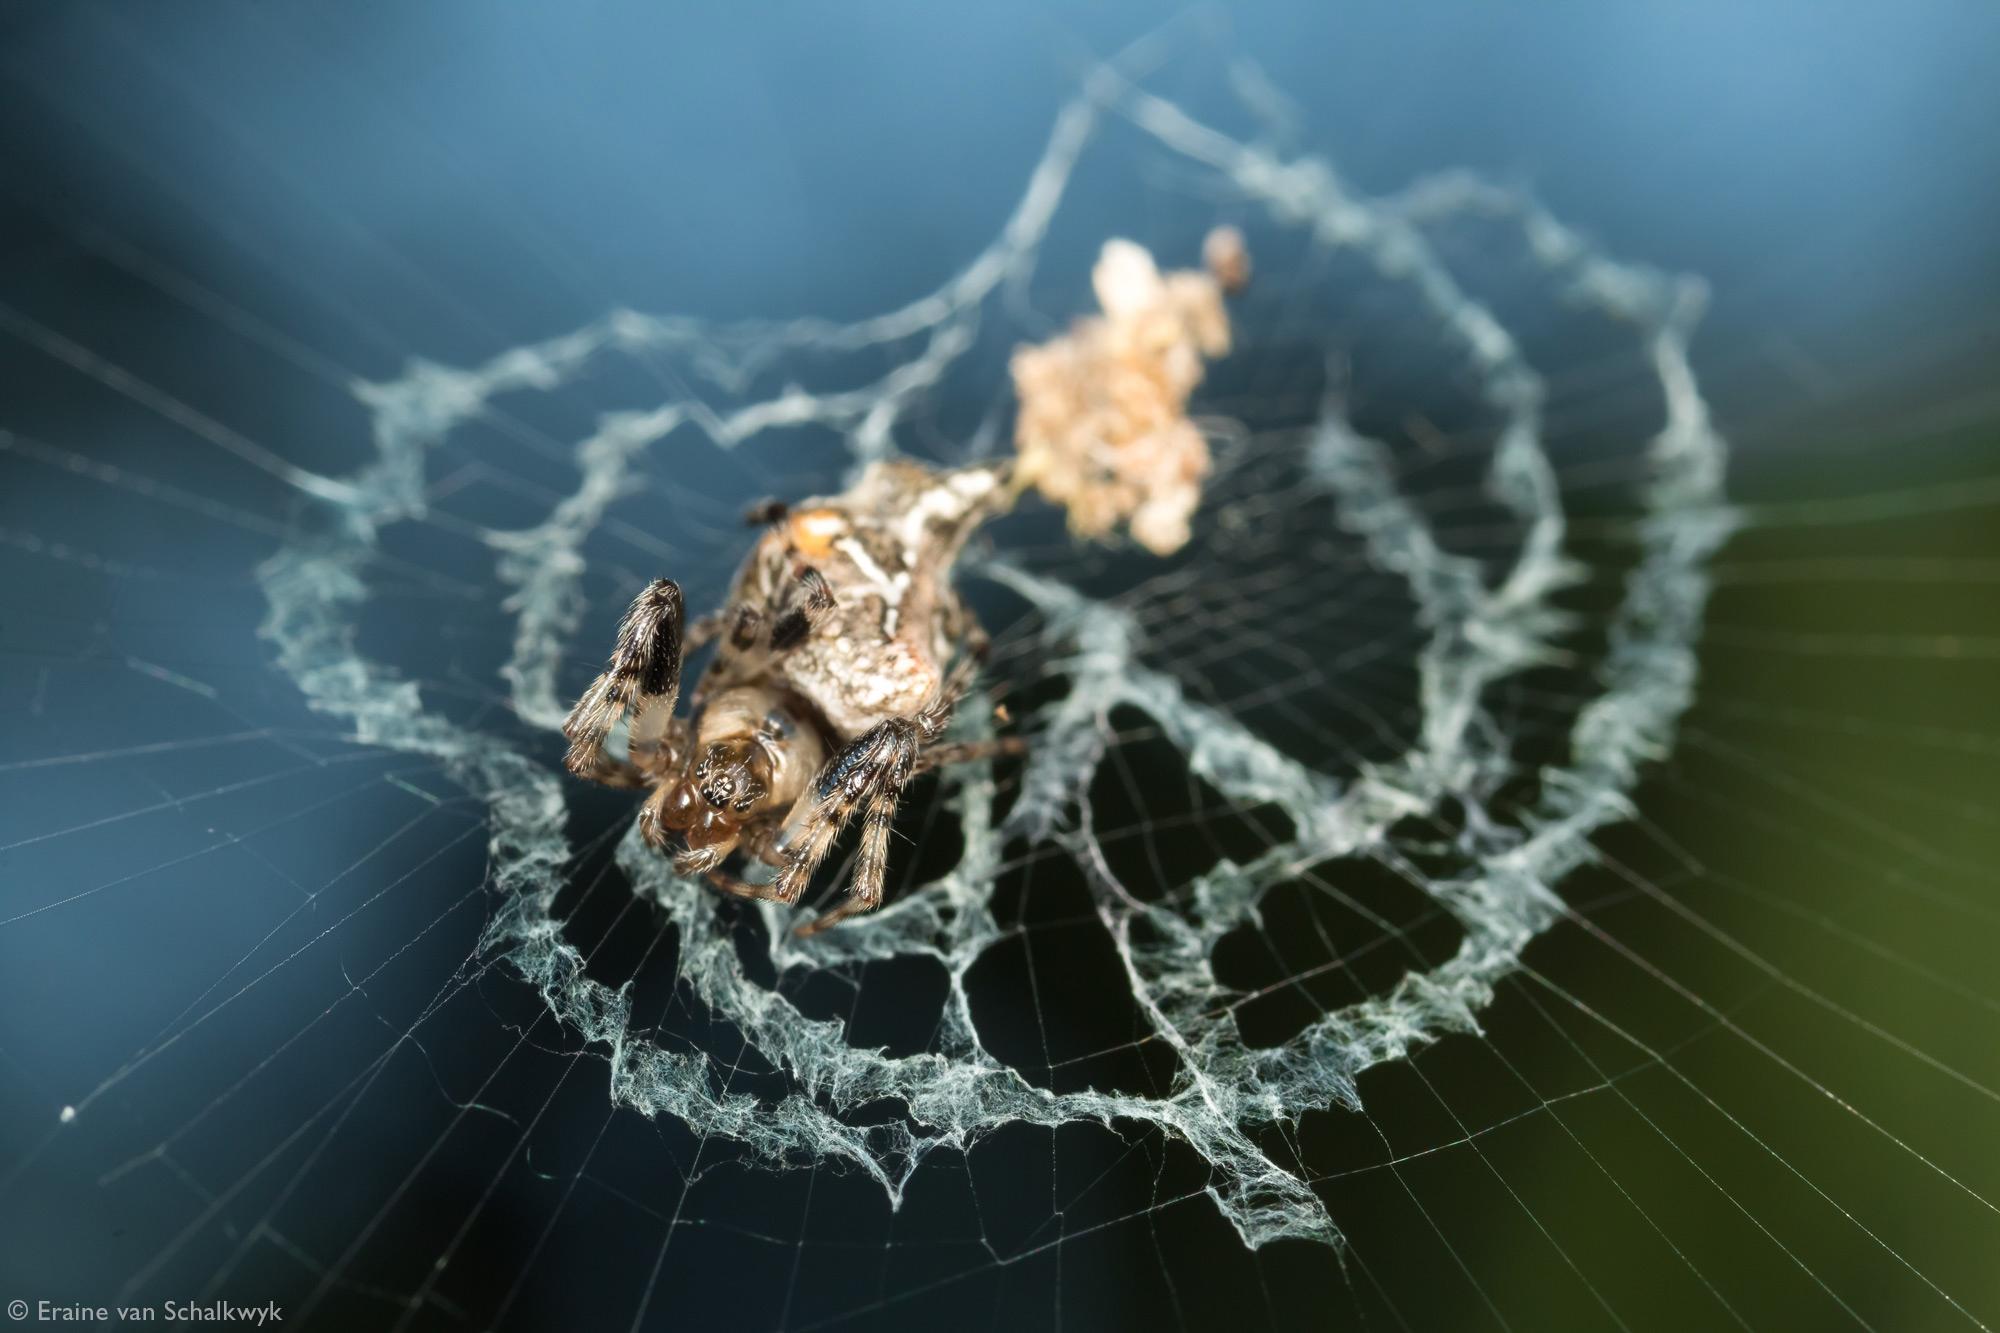 Spider in an orb web, spider, arachnid, macro photography